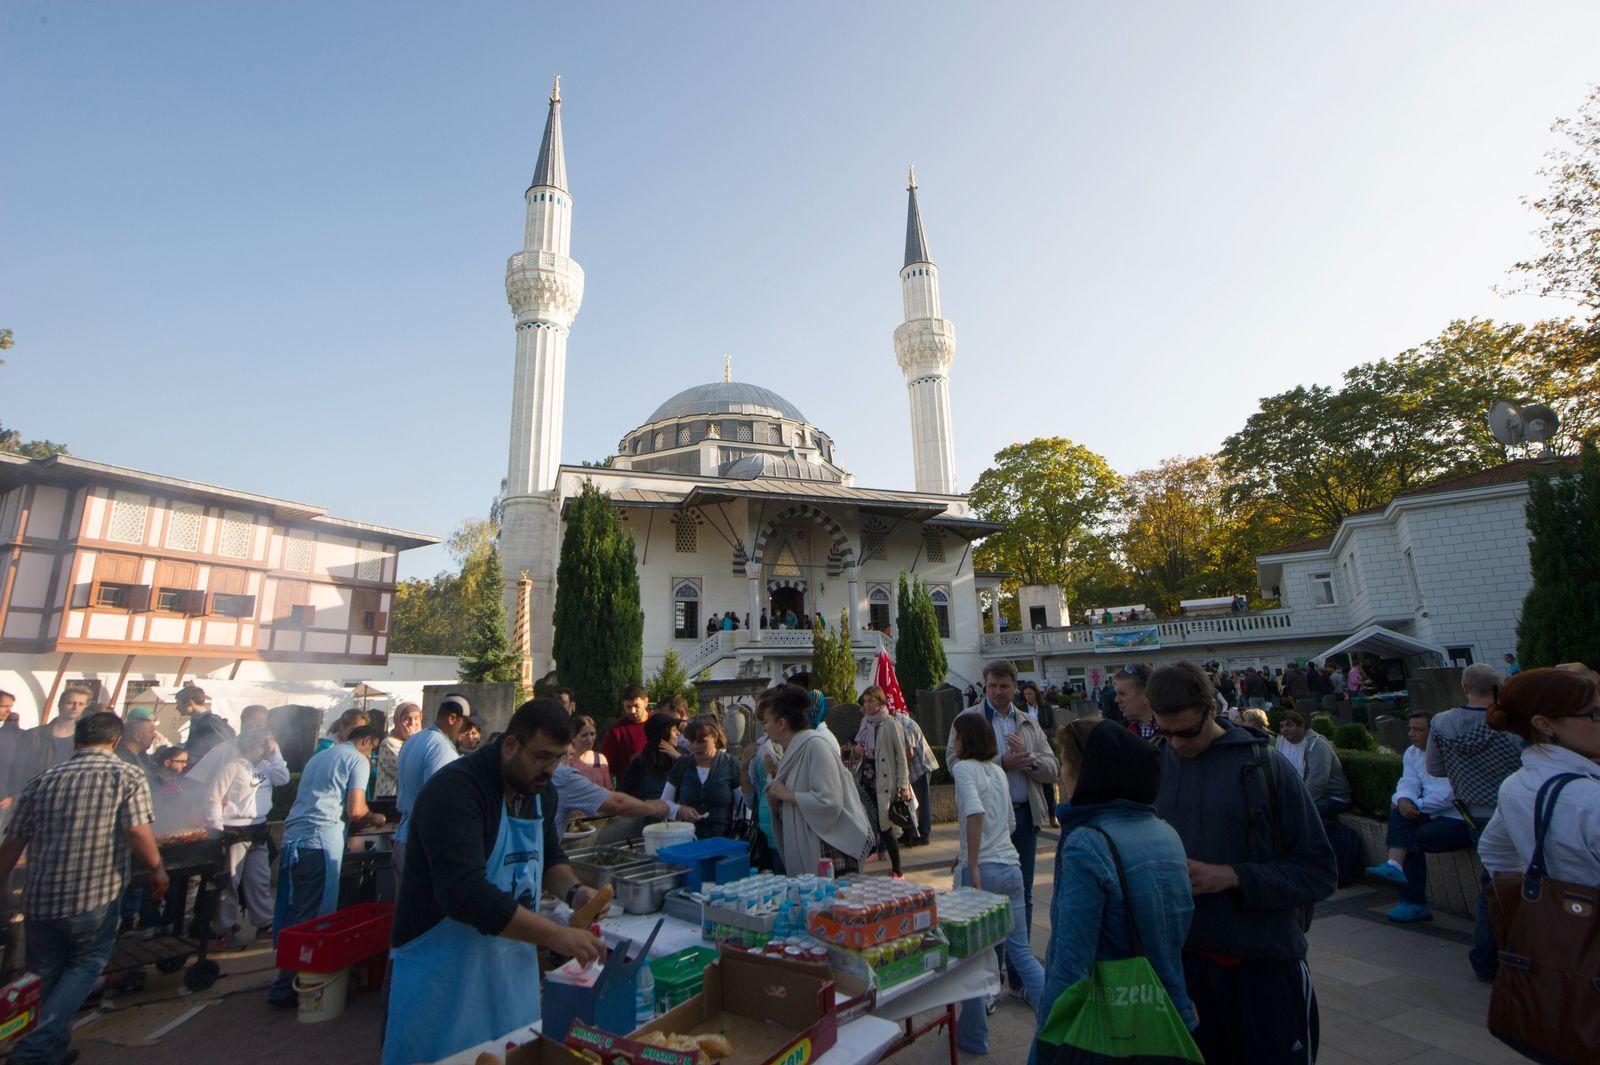 Sehitlik/ Moschee